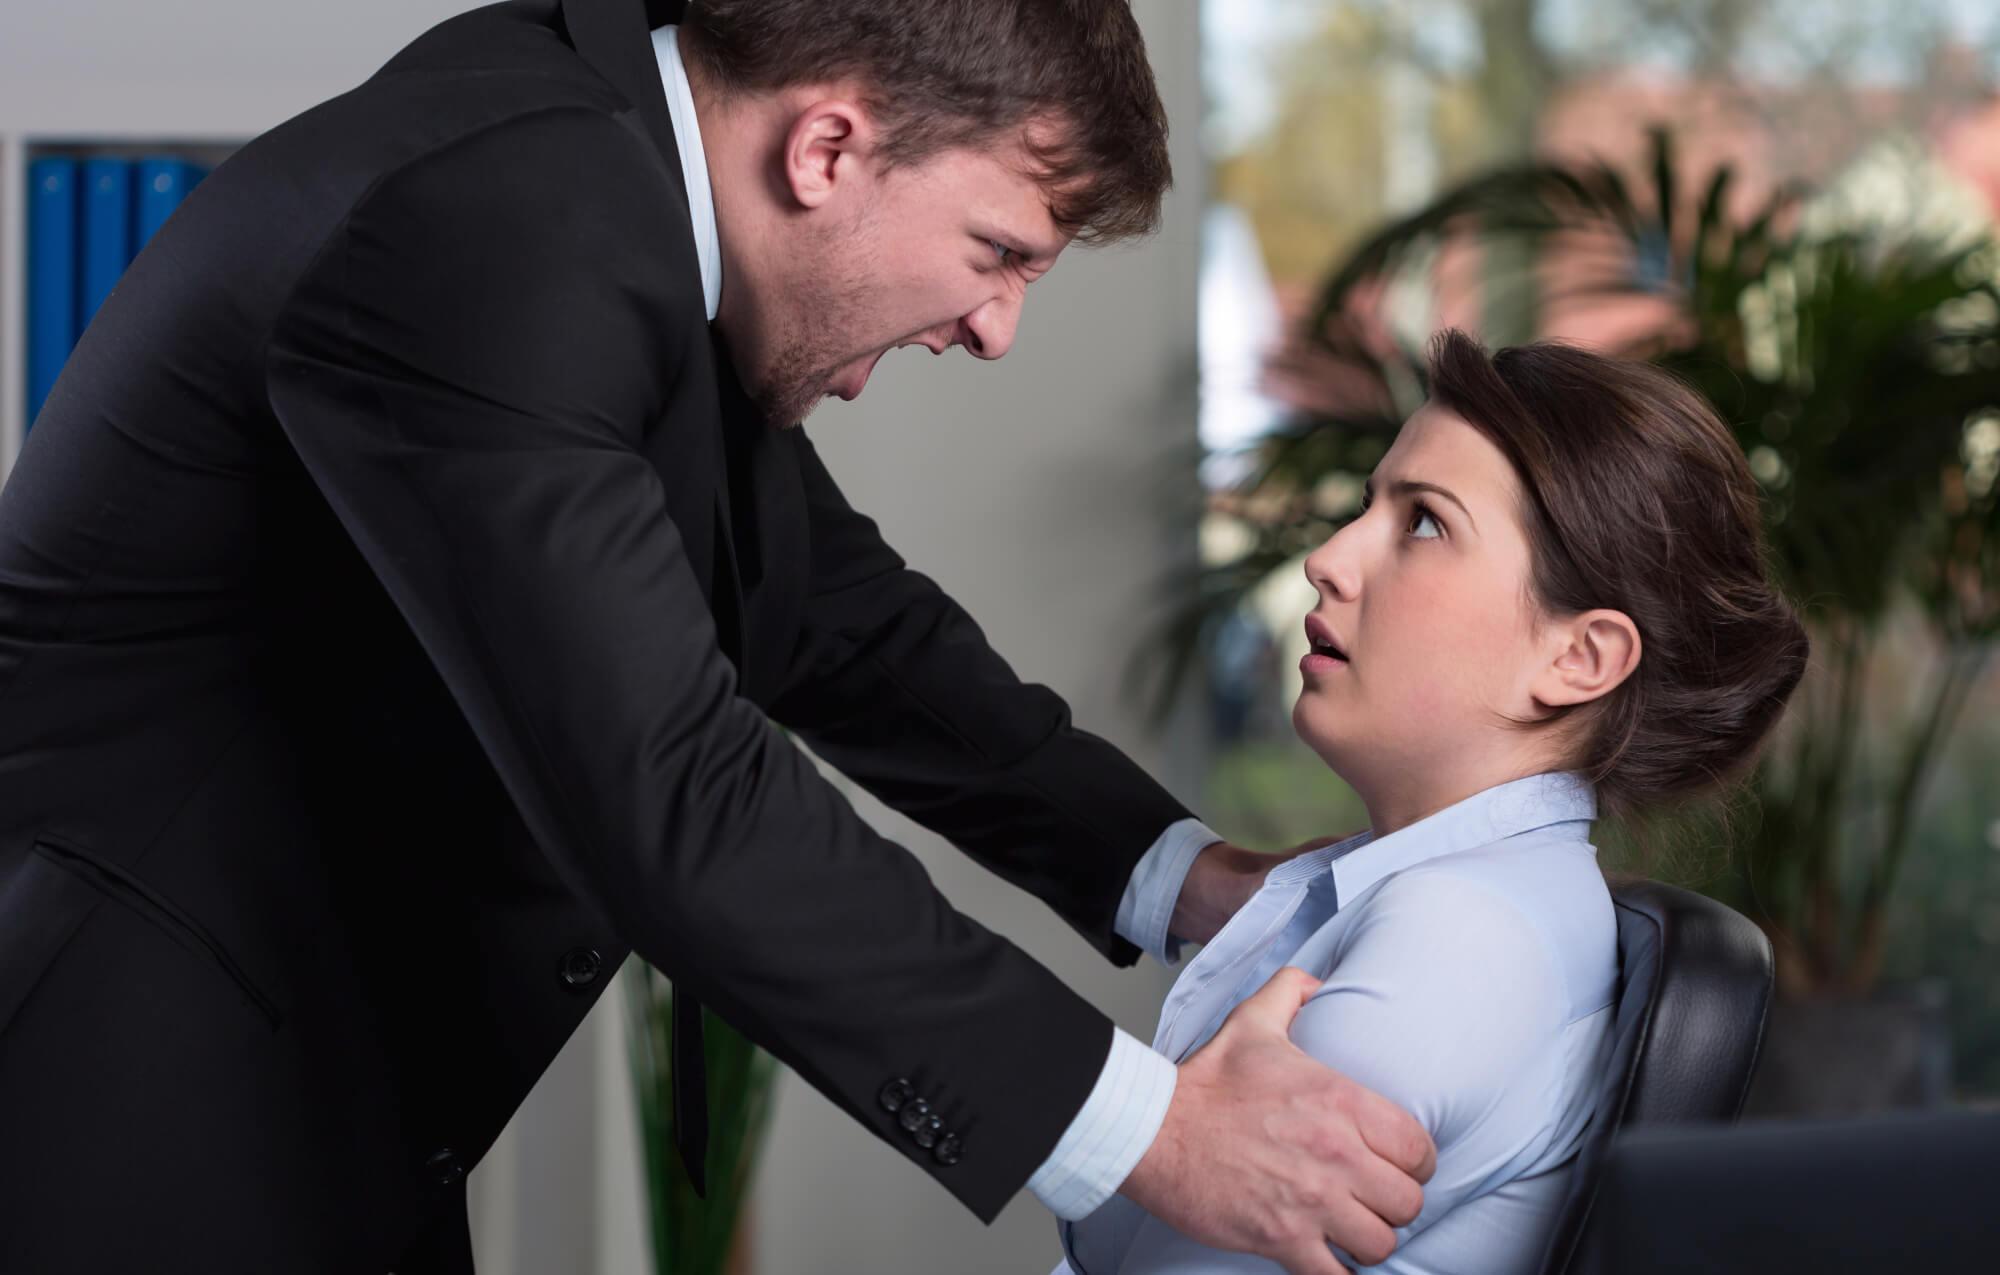 Vold på jobben? Kontakt advokat.